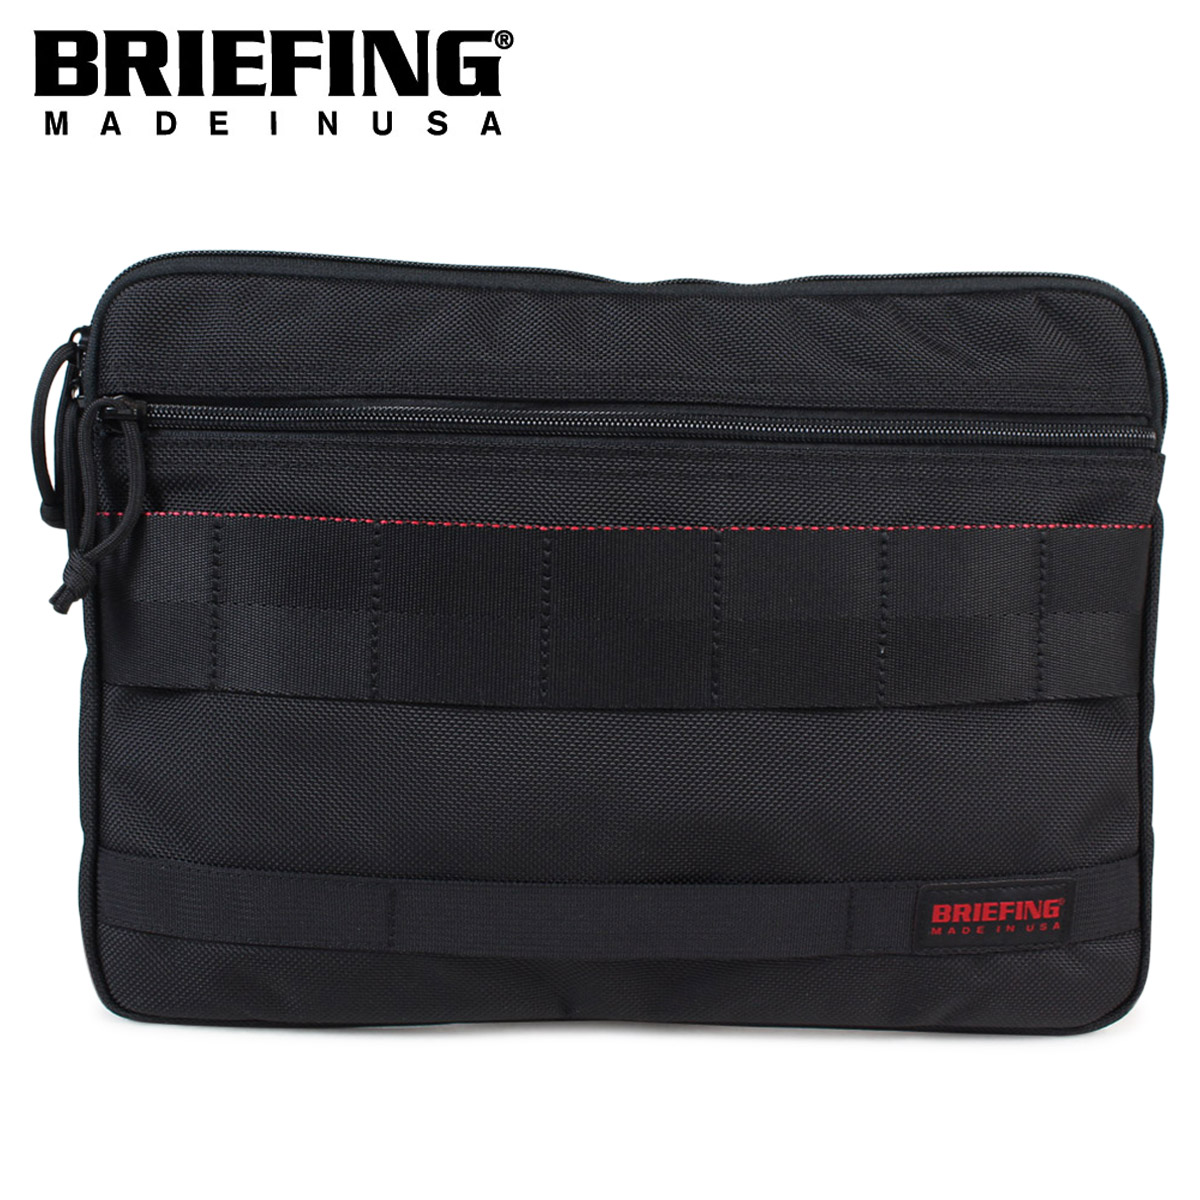 BRIEFING ブリーフィング バッグ クラッチバッグ メンズ A4 CLUCH ブラック 黒 BRF488219